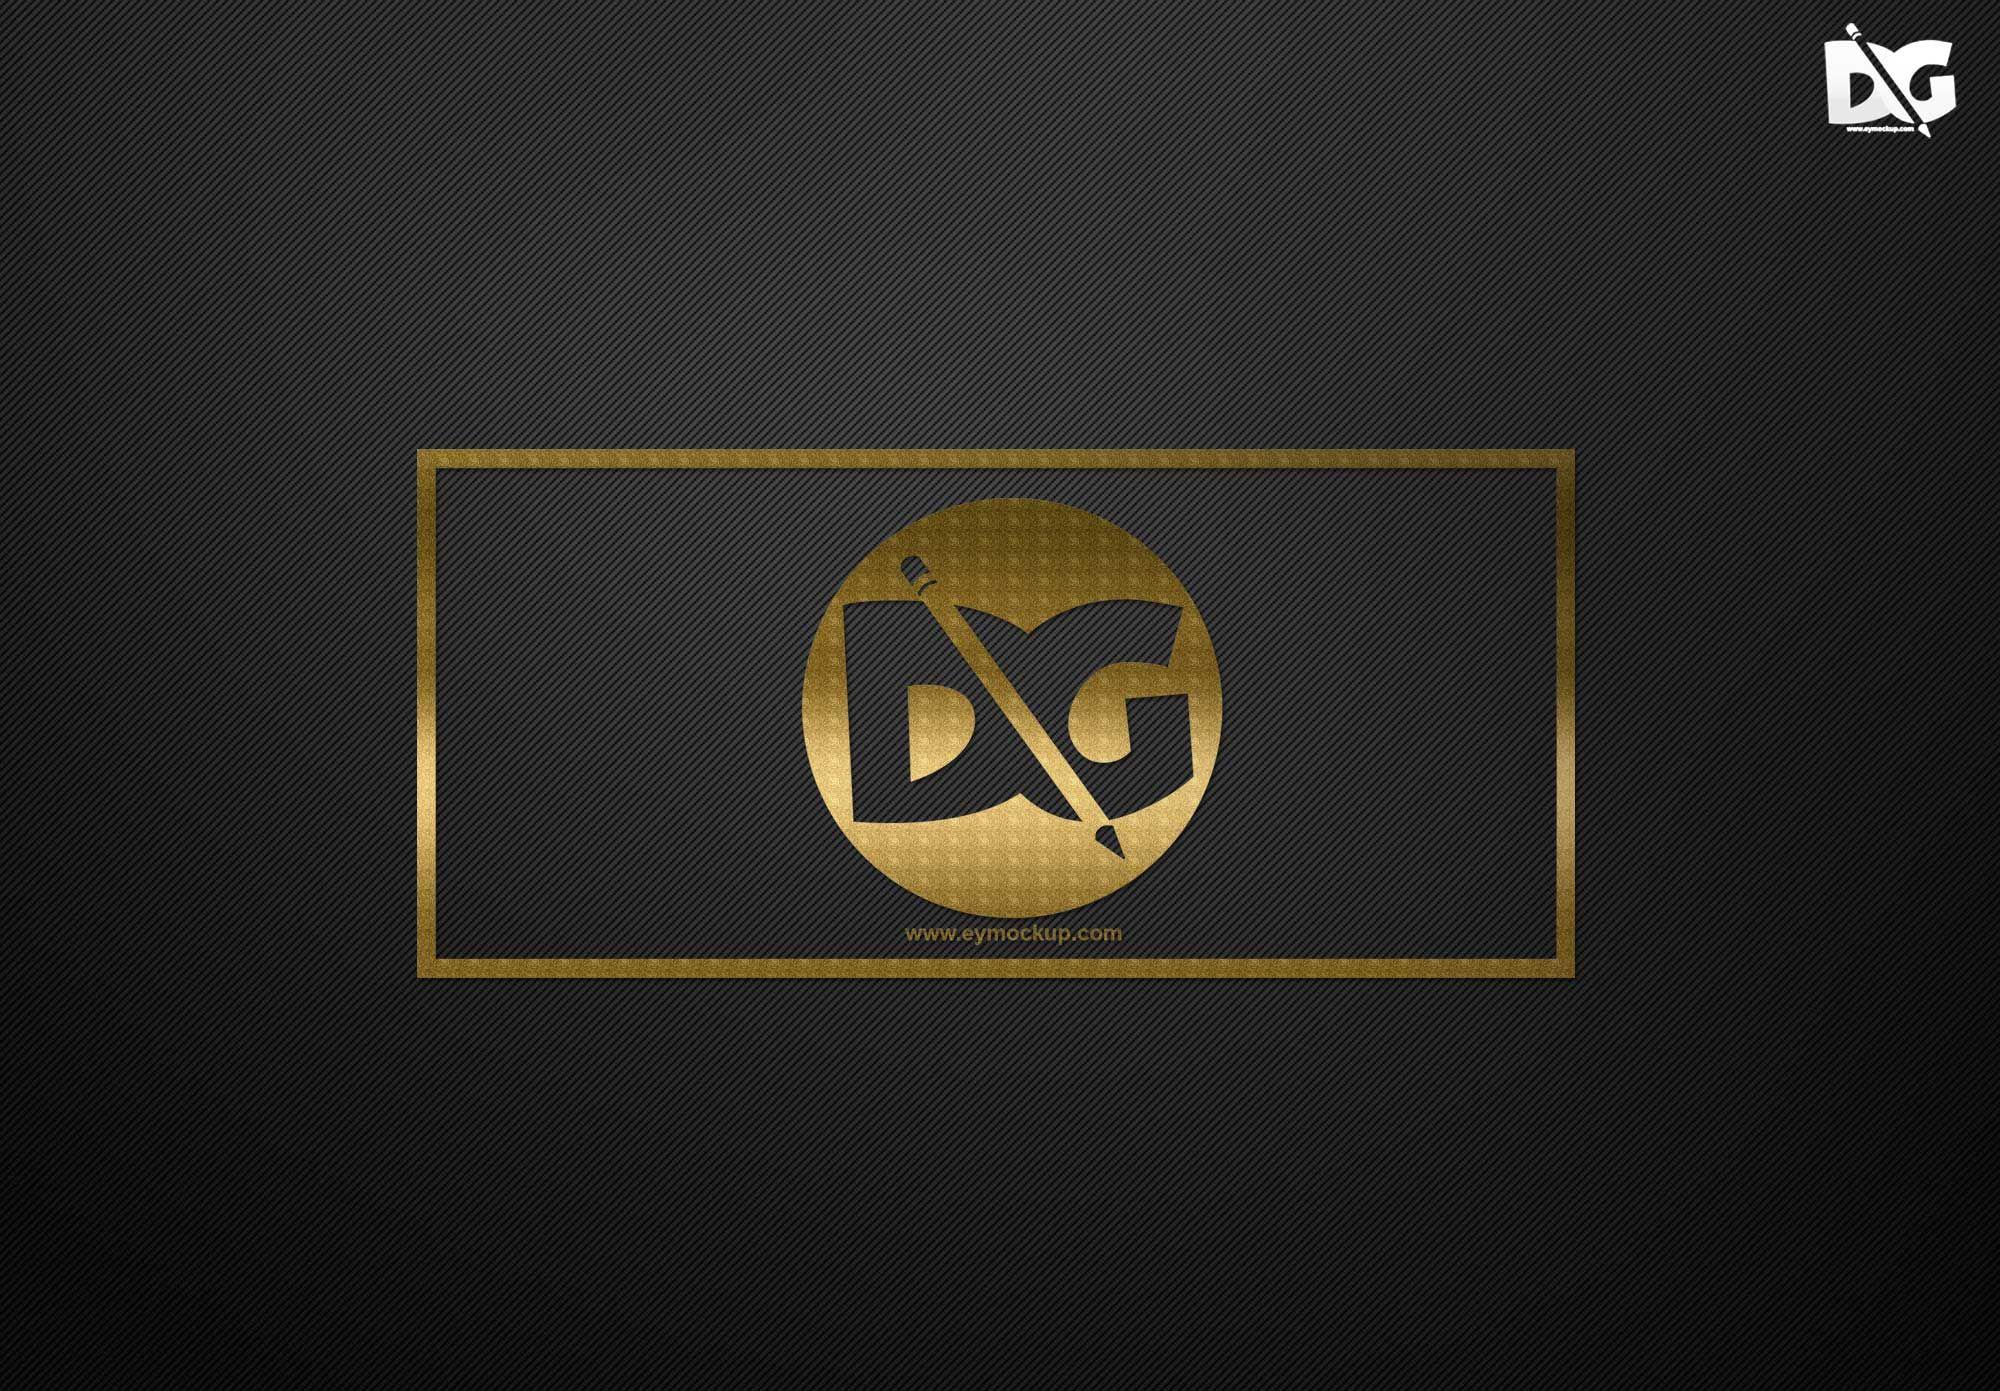 Free Clean Gold Logo Mockups Psd Logo Mockup Free Logo Mockup Psd Mockup Free Psd